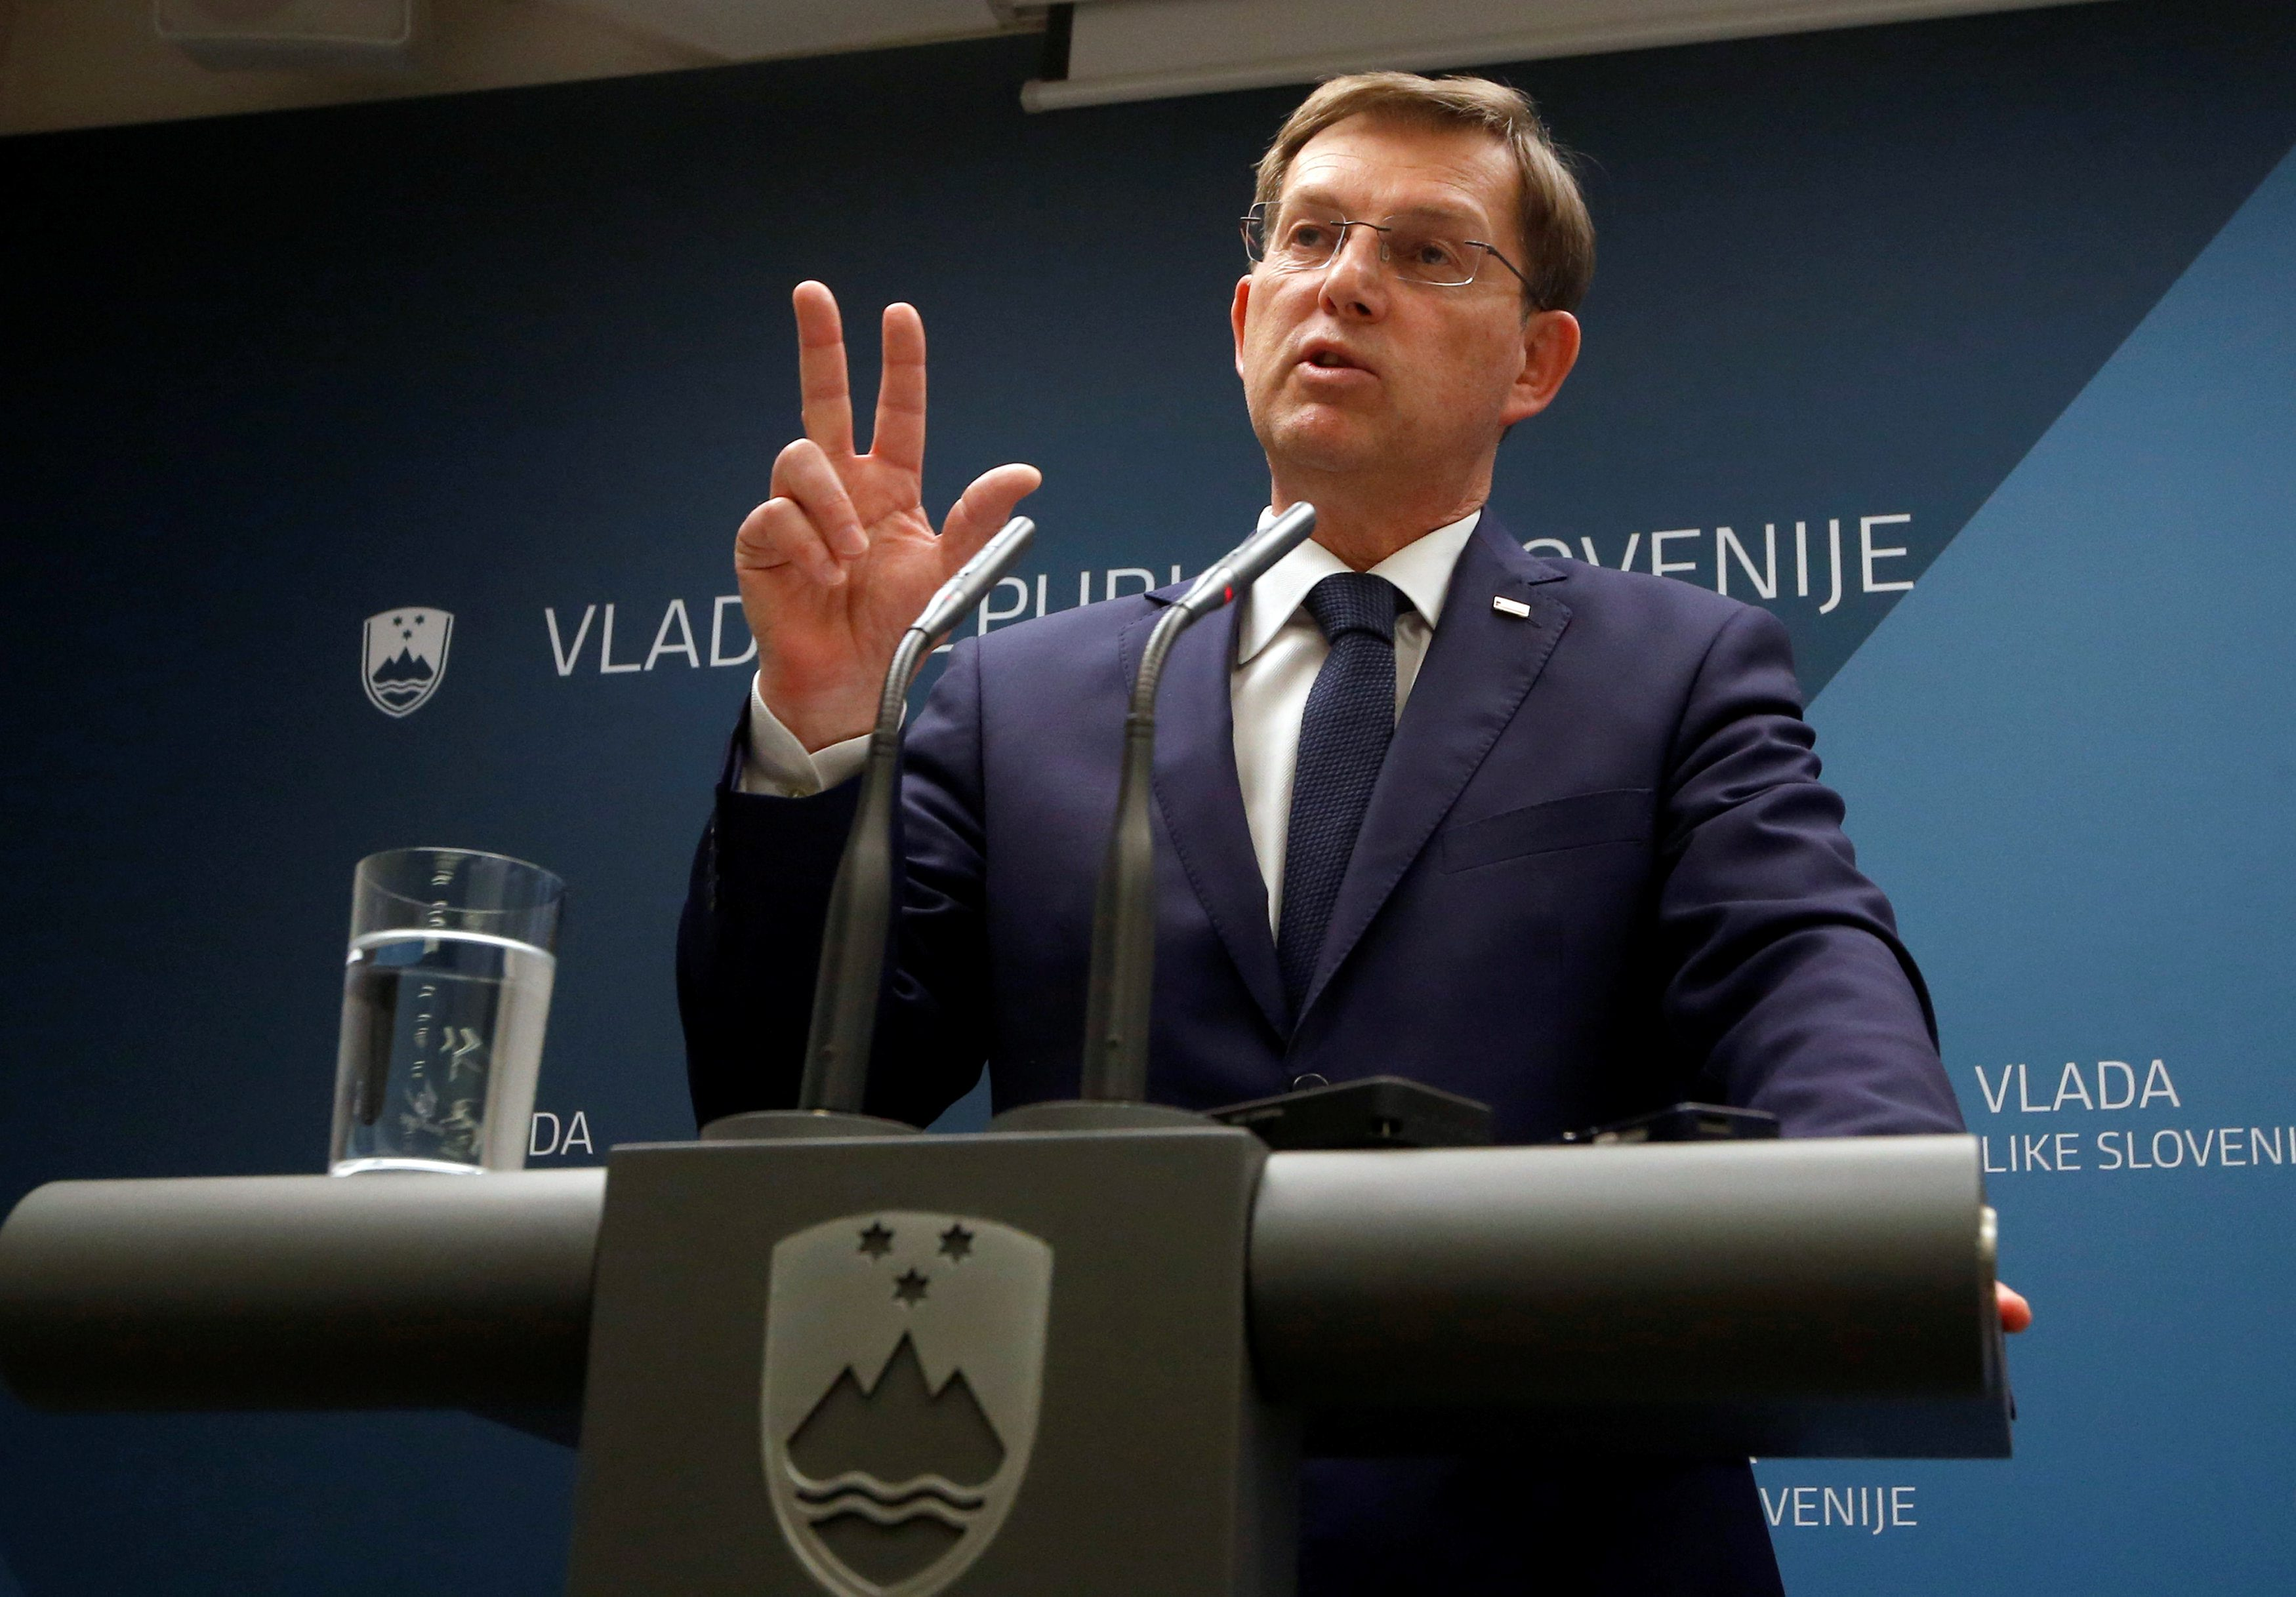 2018-03-14T214754Z_2091533054_RC1BFBAE3300_RTRMADP_3_SLOVENIA-POLITICS